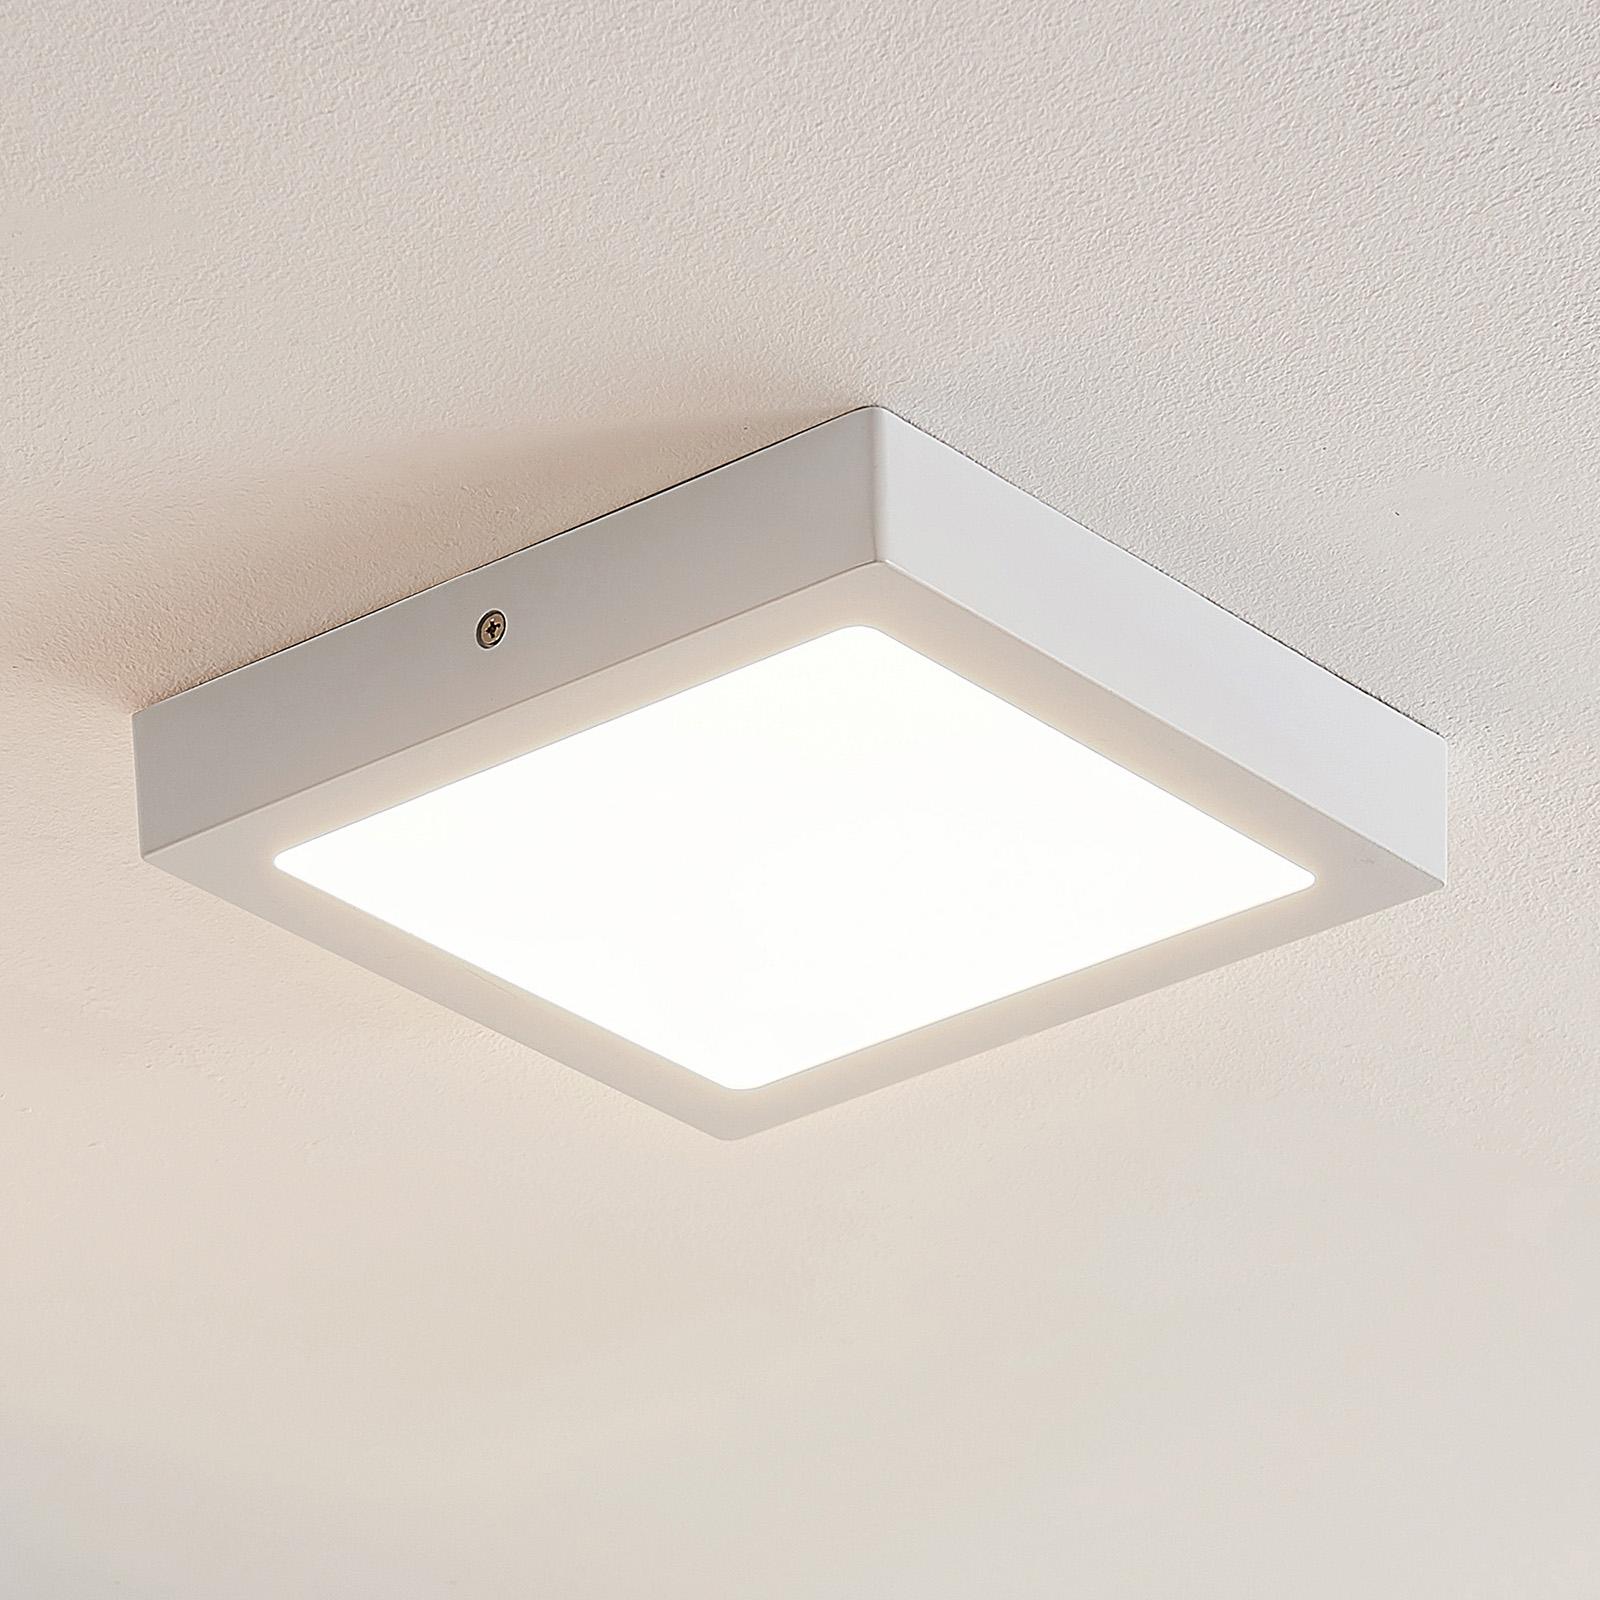 ELC Merina LED-Deckenlampe weiß, 21,5 x 21,5cm